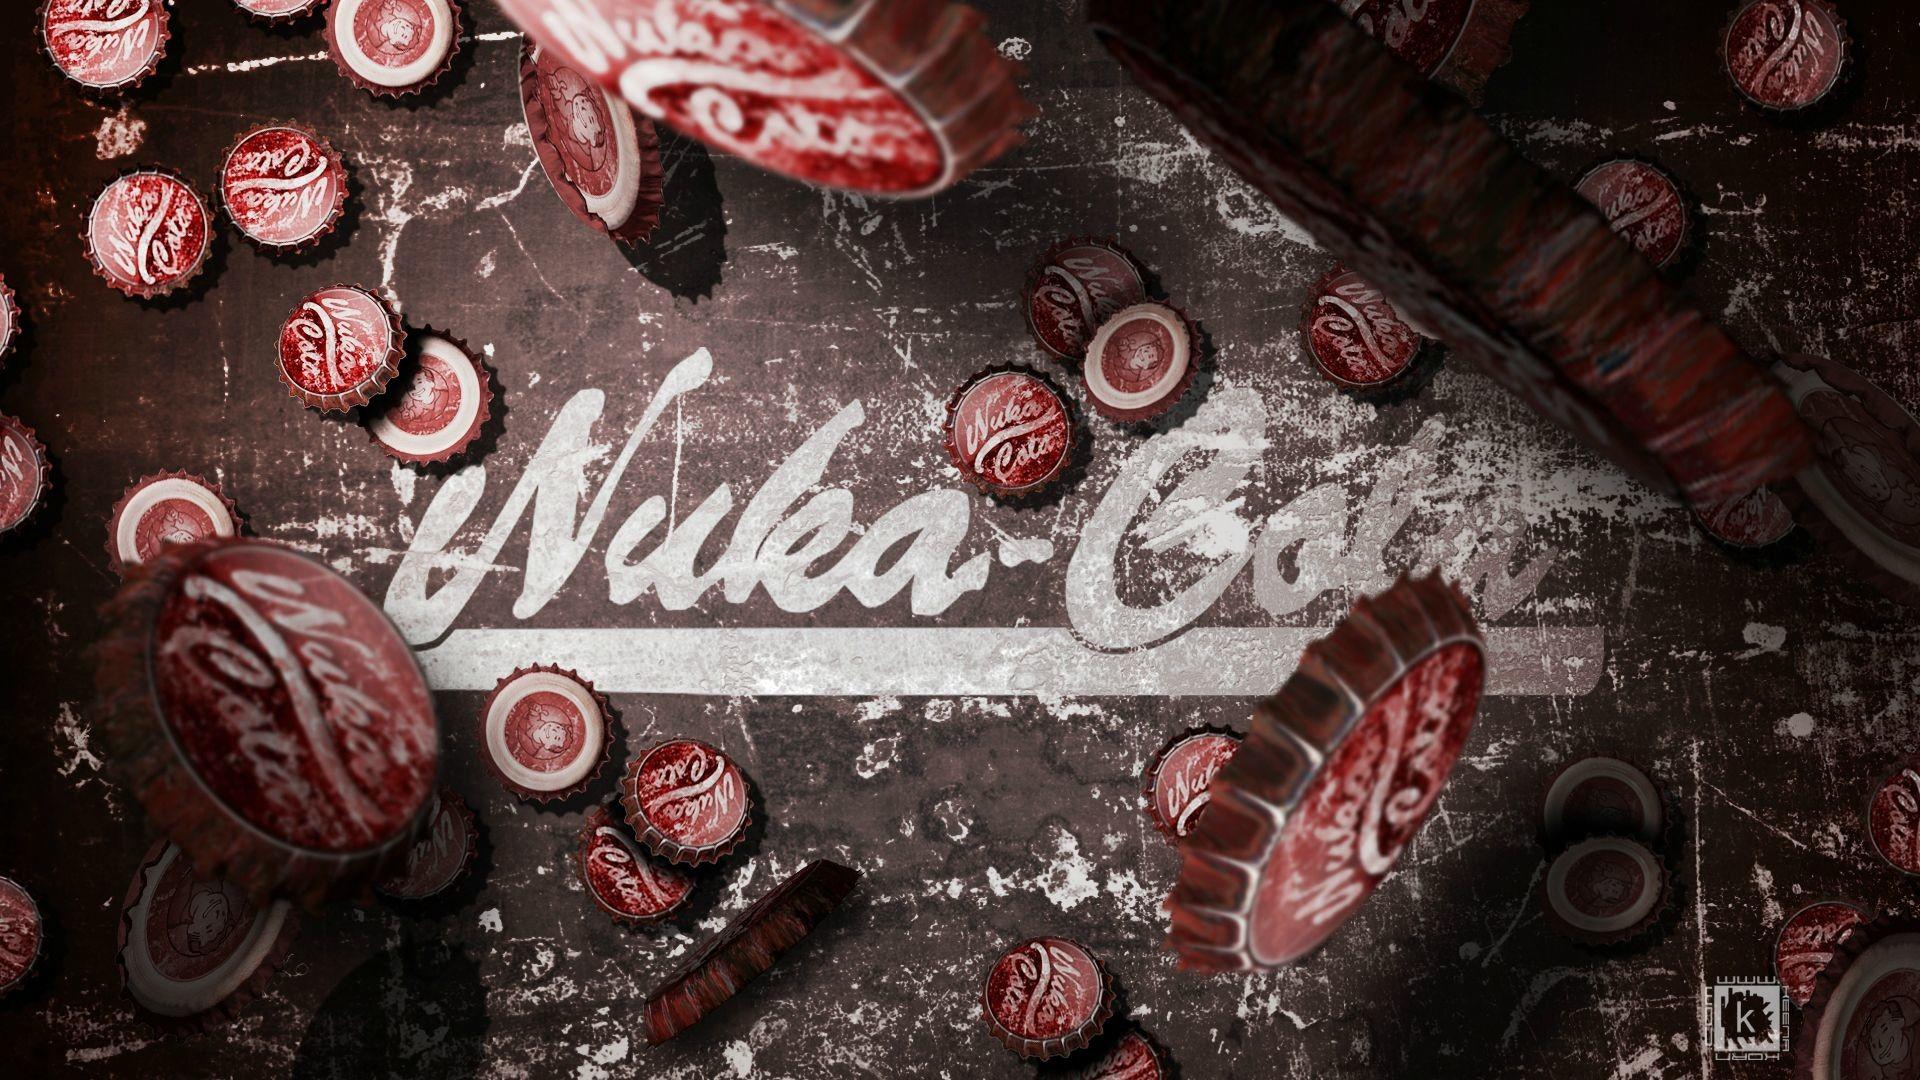 Nuka Cola Wallpaper 73 Images